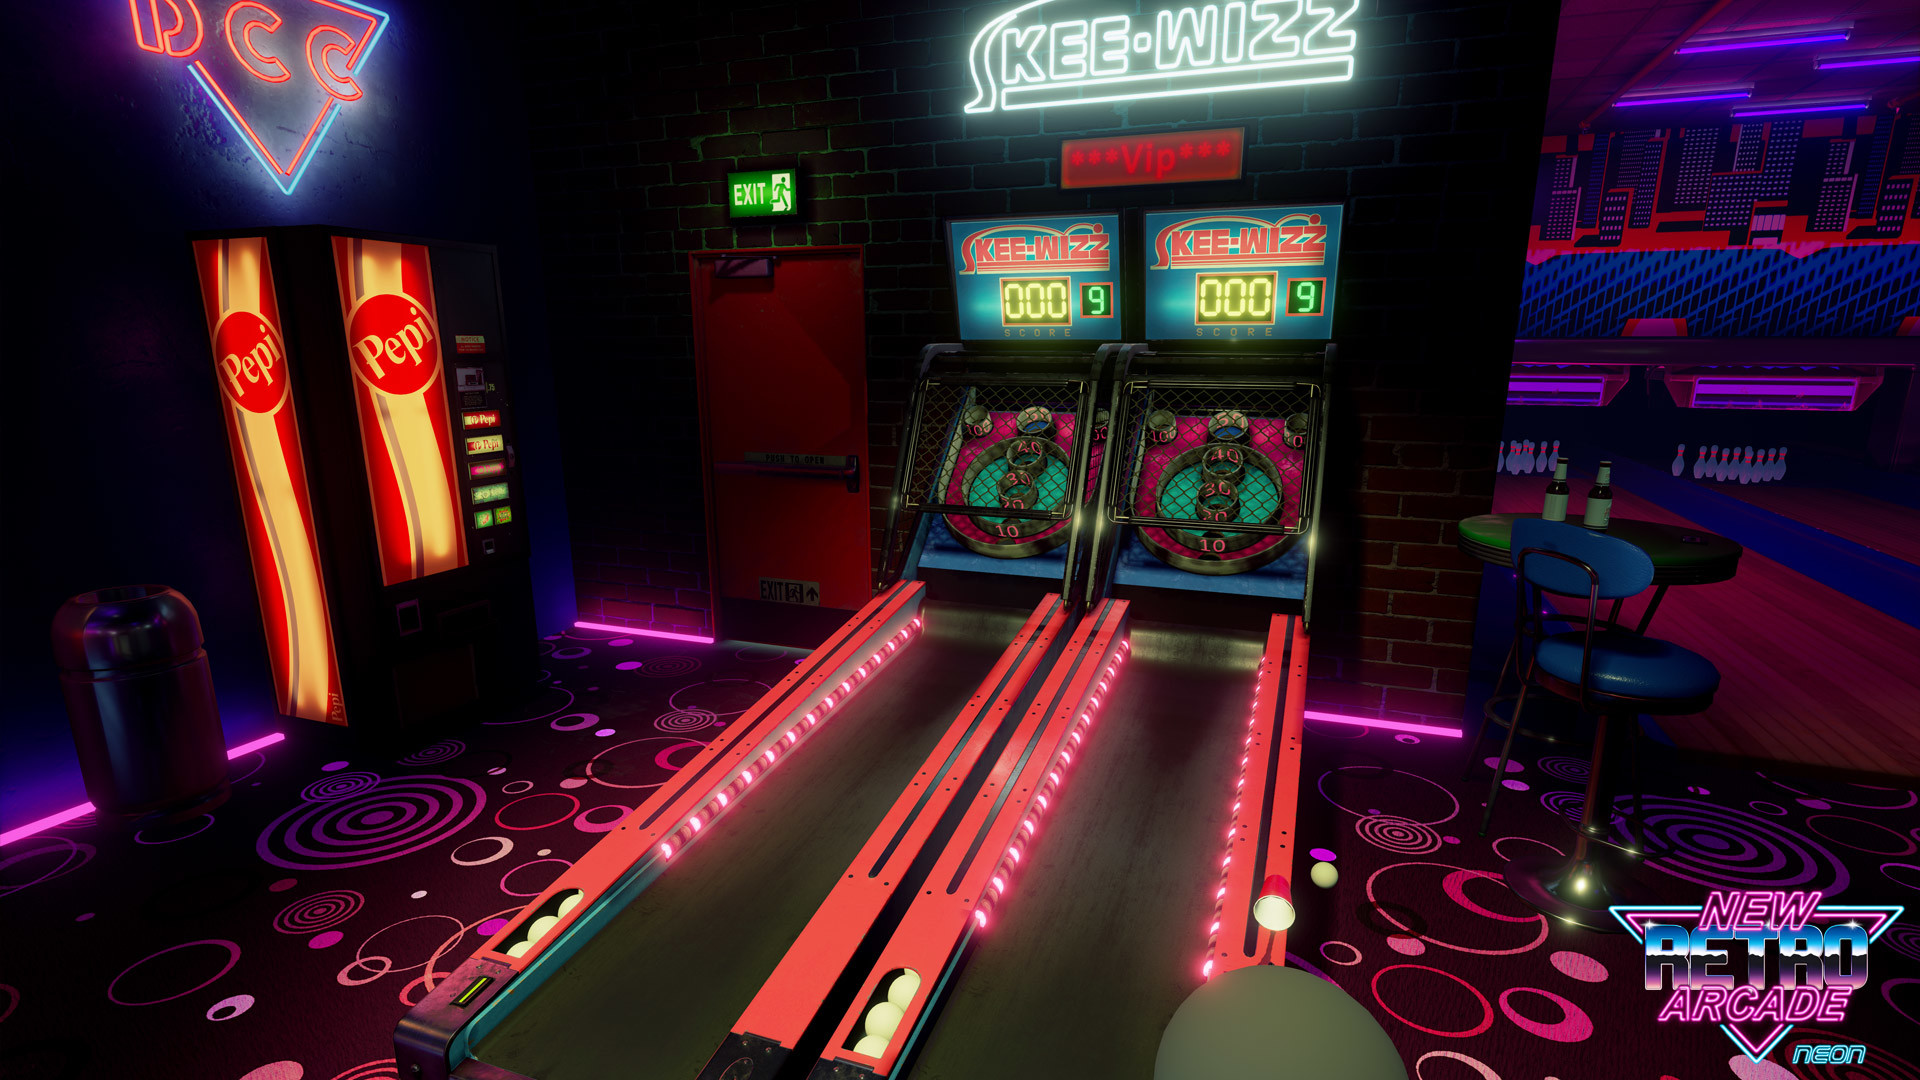 new retro arcade neon launch (11)